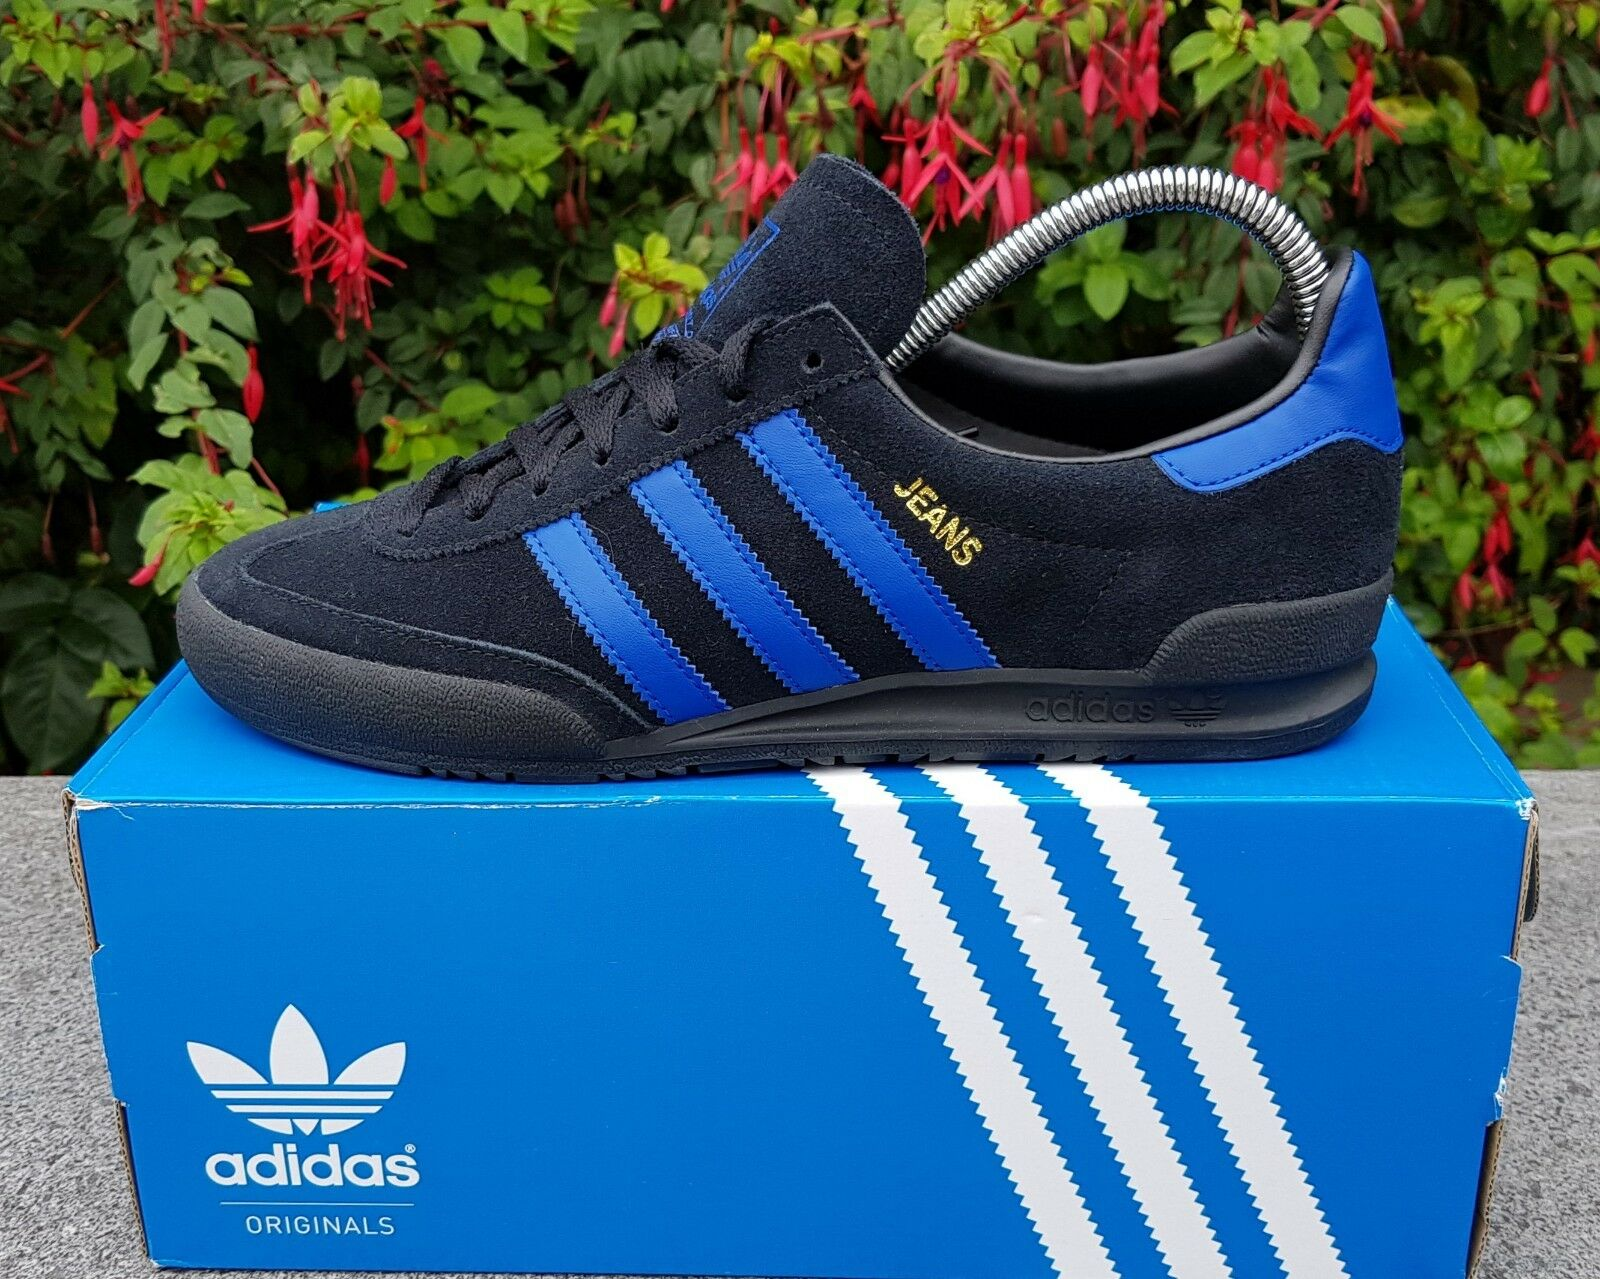 BNWB & Original Adidas Negro Originals Jeans MkII Mk2 Negro Adidas Gamuza Zapatillas Talla 10.5 700b0b